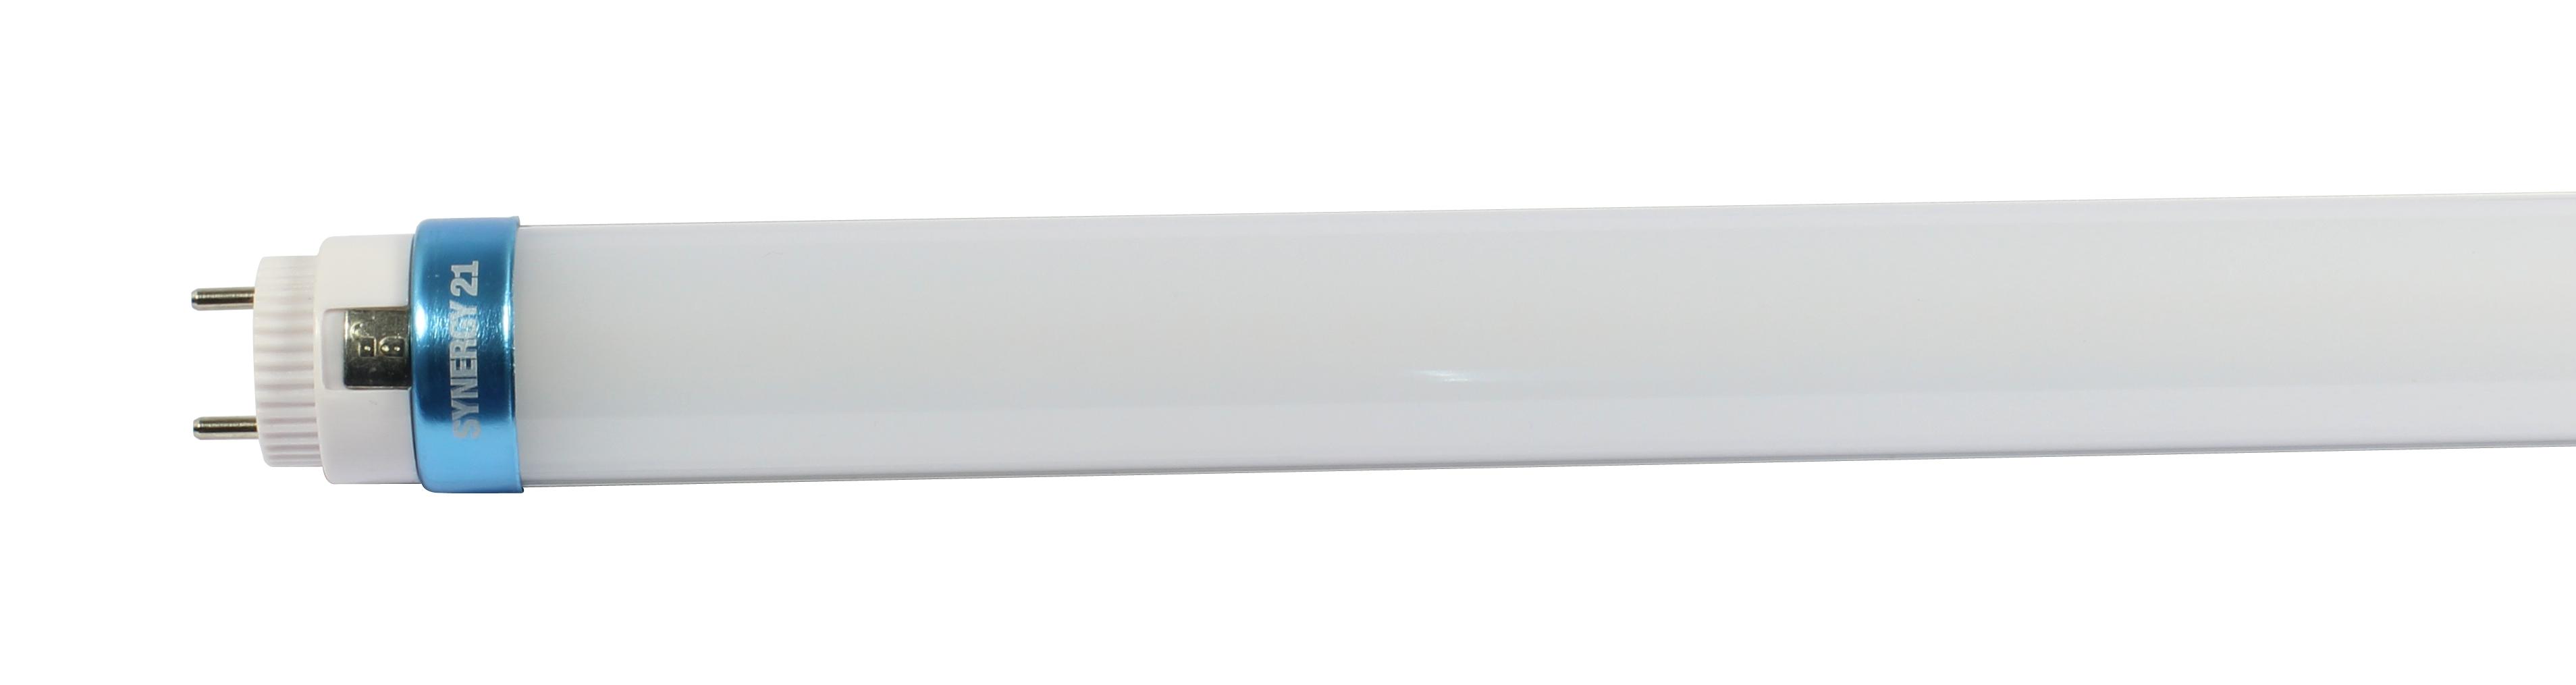 136955 synergy 21 led tube sl t8 serie 60cm kaltwei vde led tubes r hren led. Black Bedroom Furniture Sets. Home Design Ideas